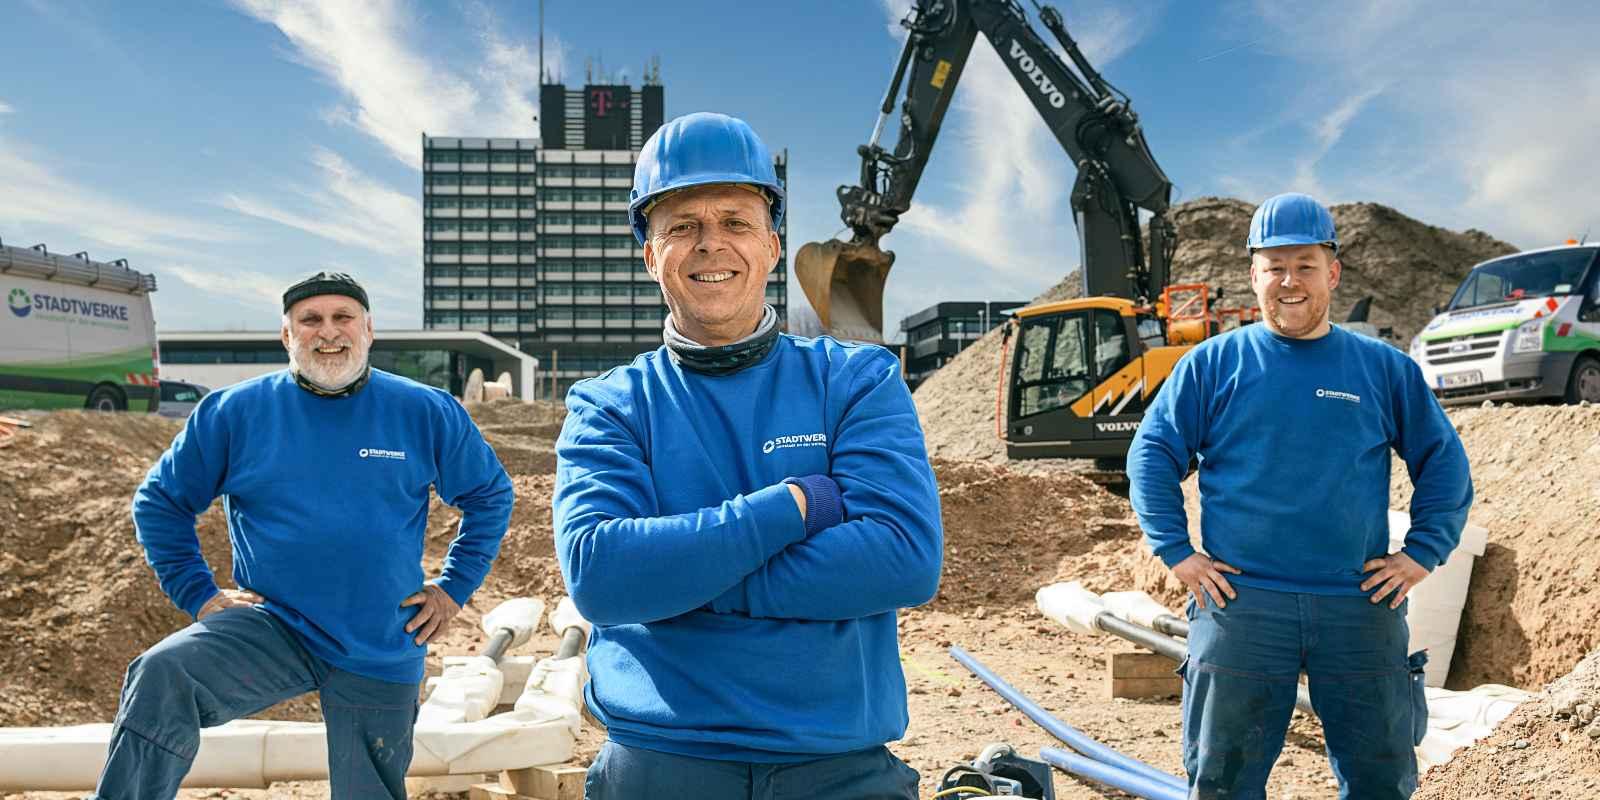 Stadtwerke Neustadt Service Kachel Bauherren Arbeiter